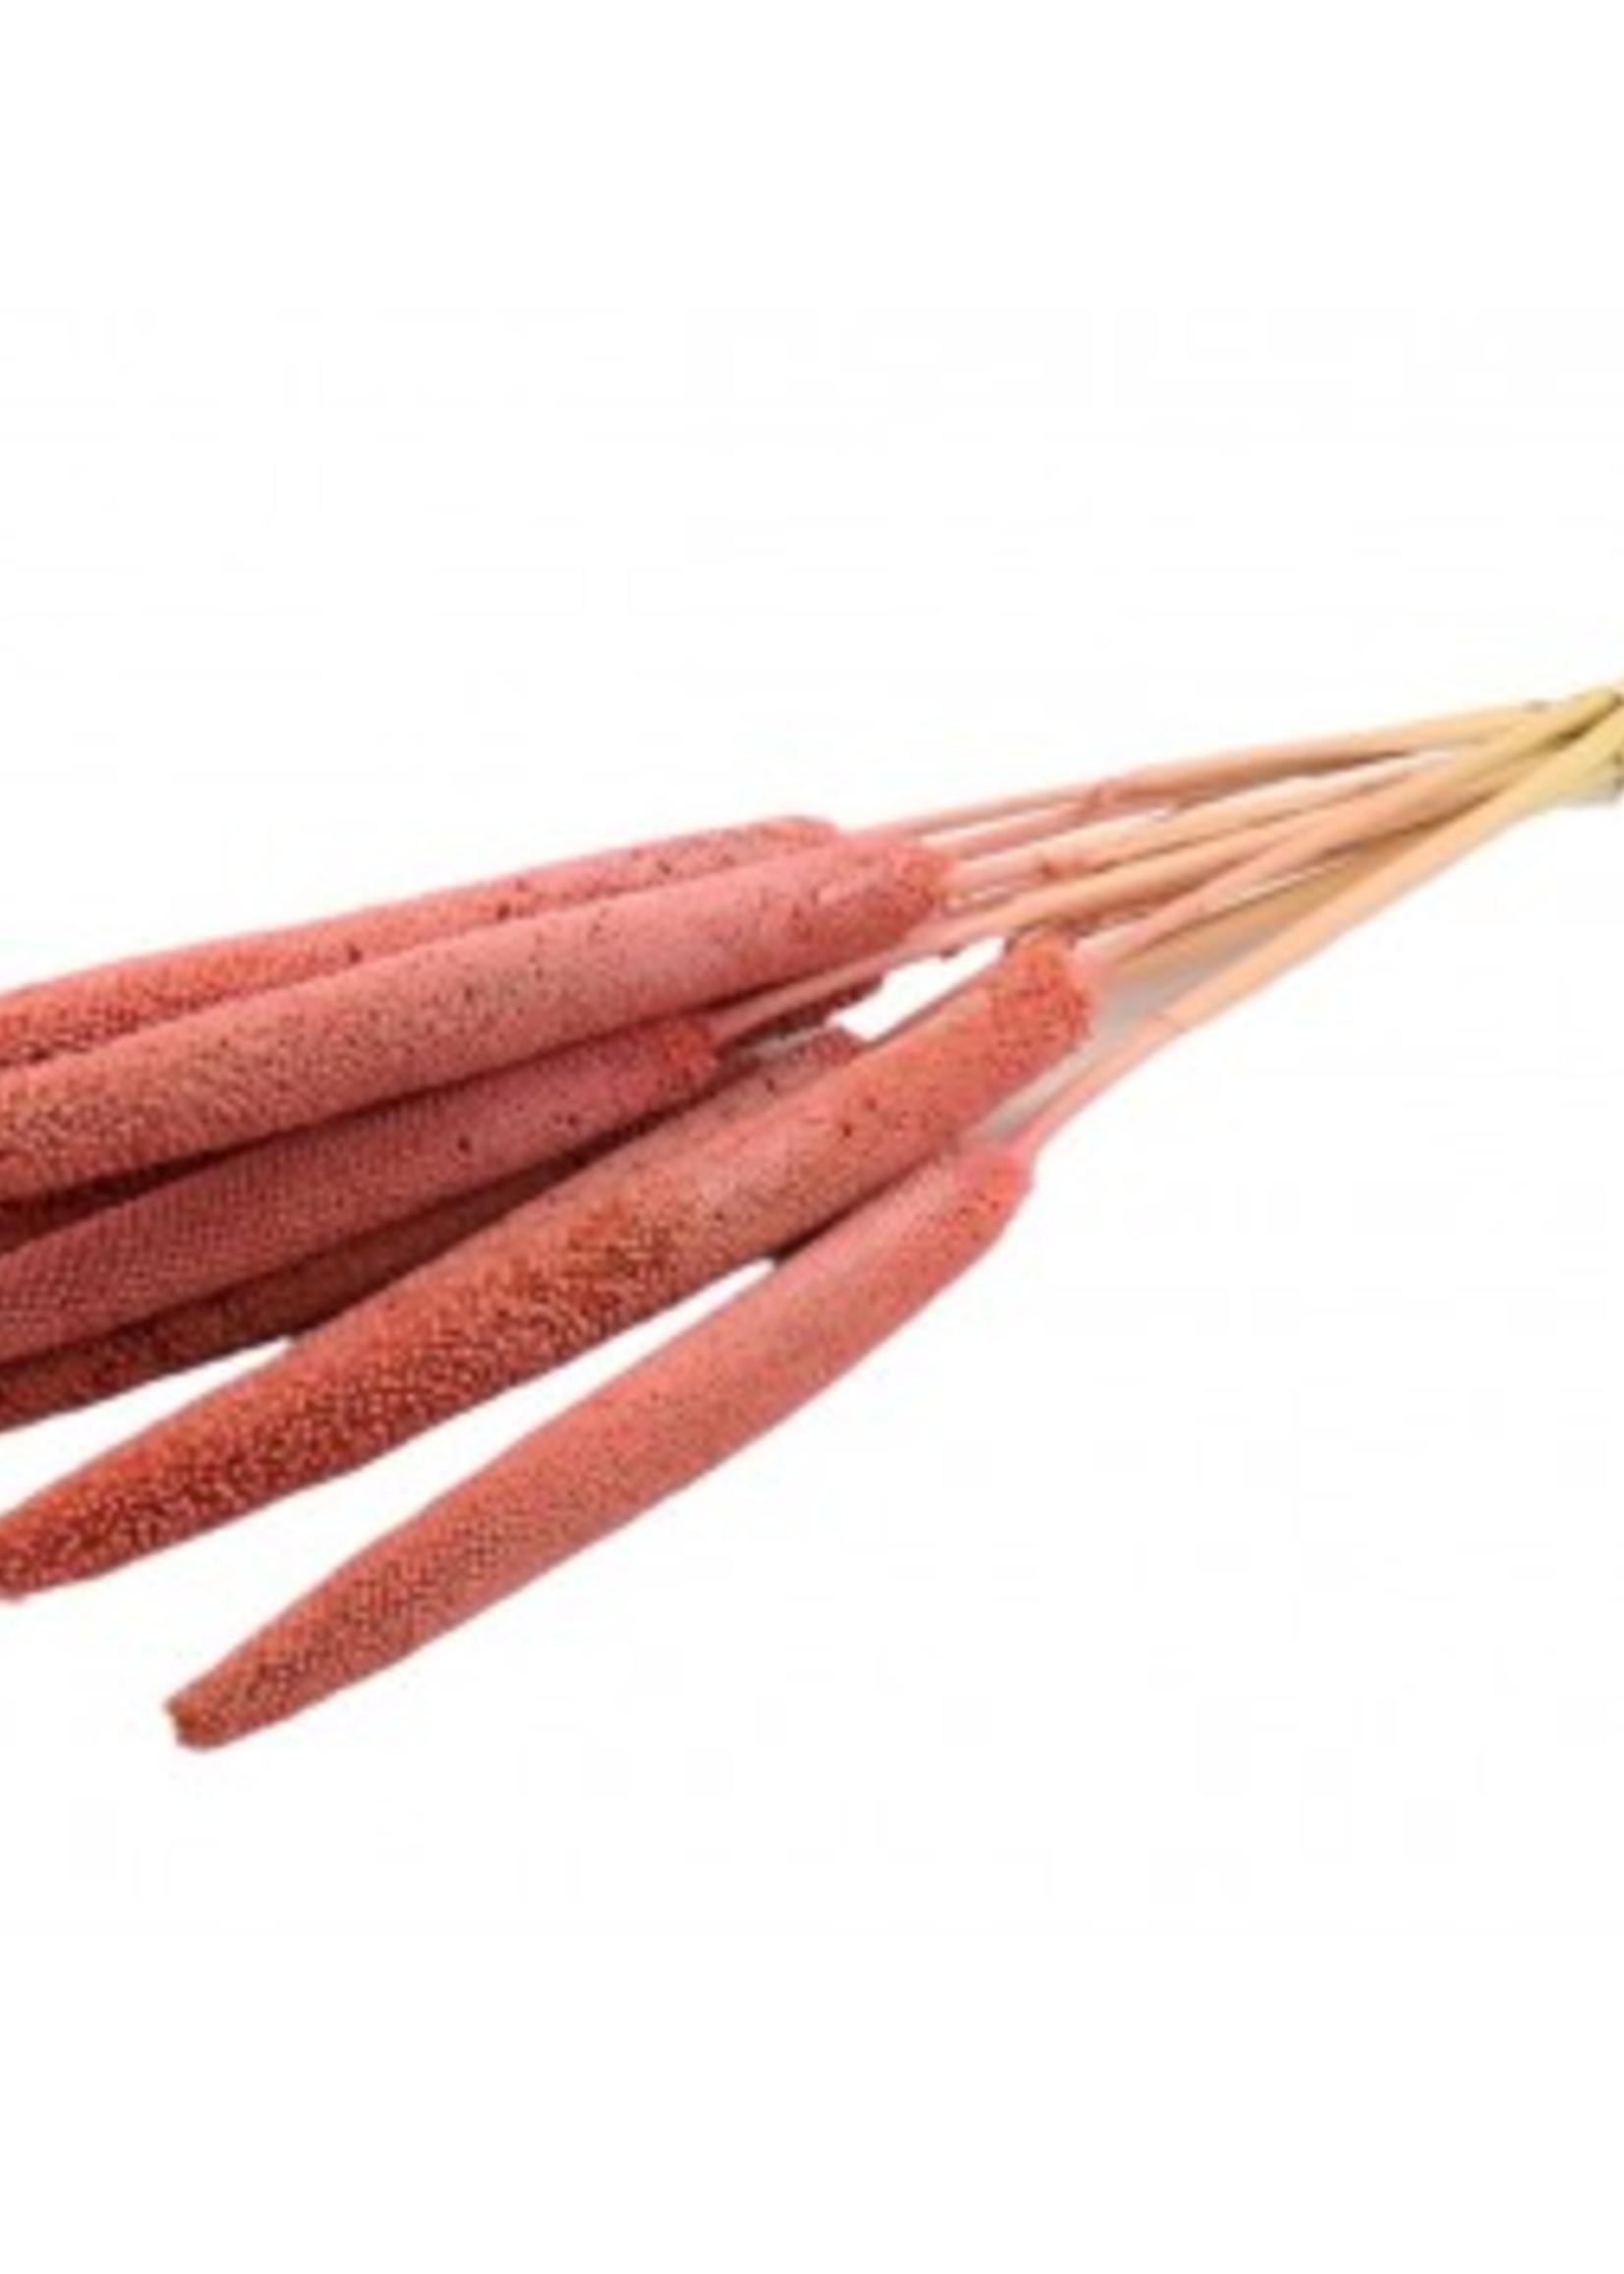 Dry flower babala pink p/s